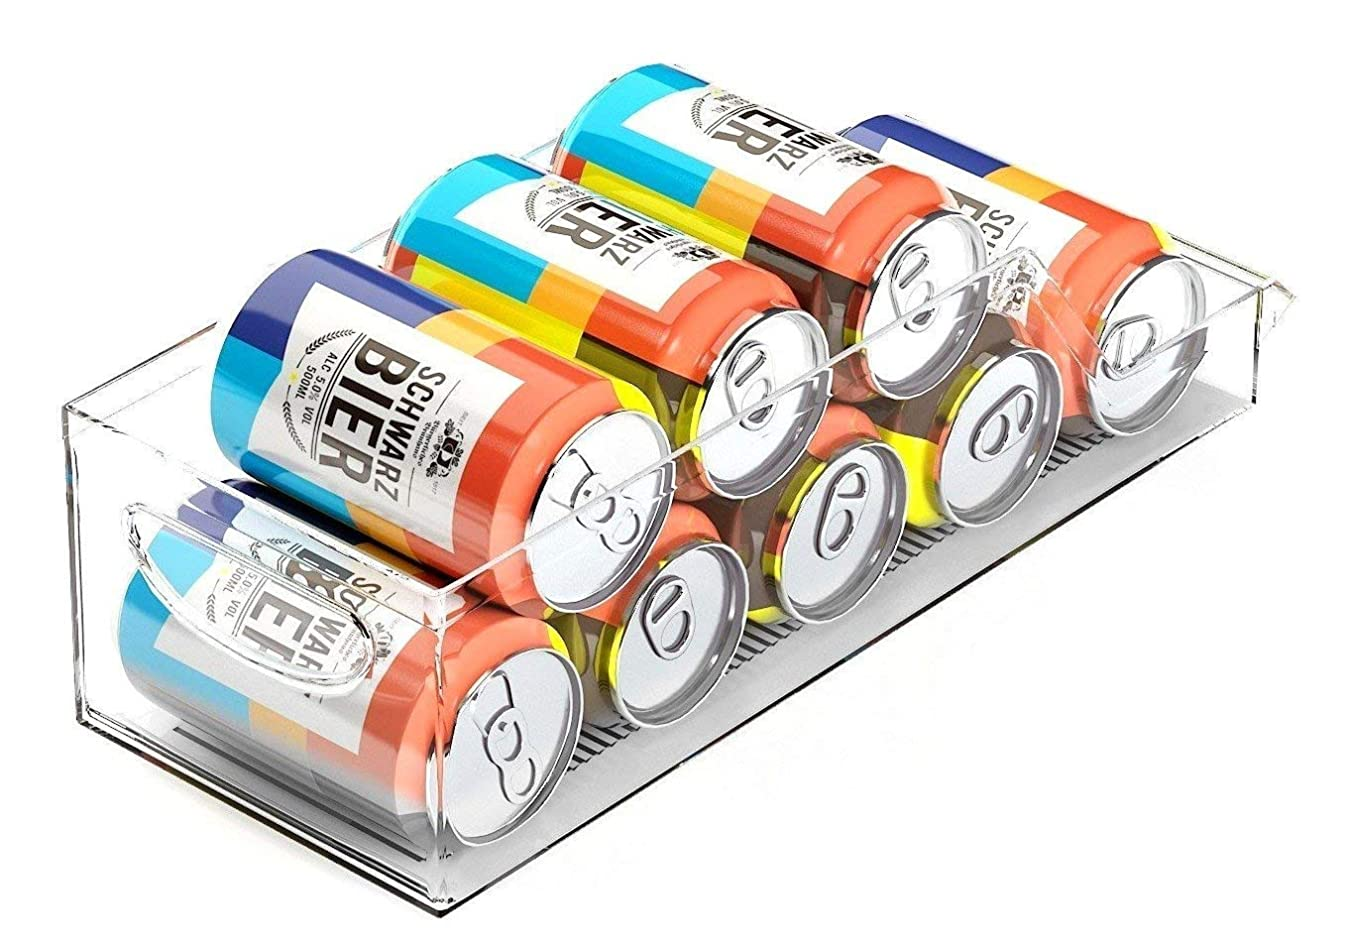 Fridge Soda Can Dispenser Pantry, Organizer Rack